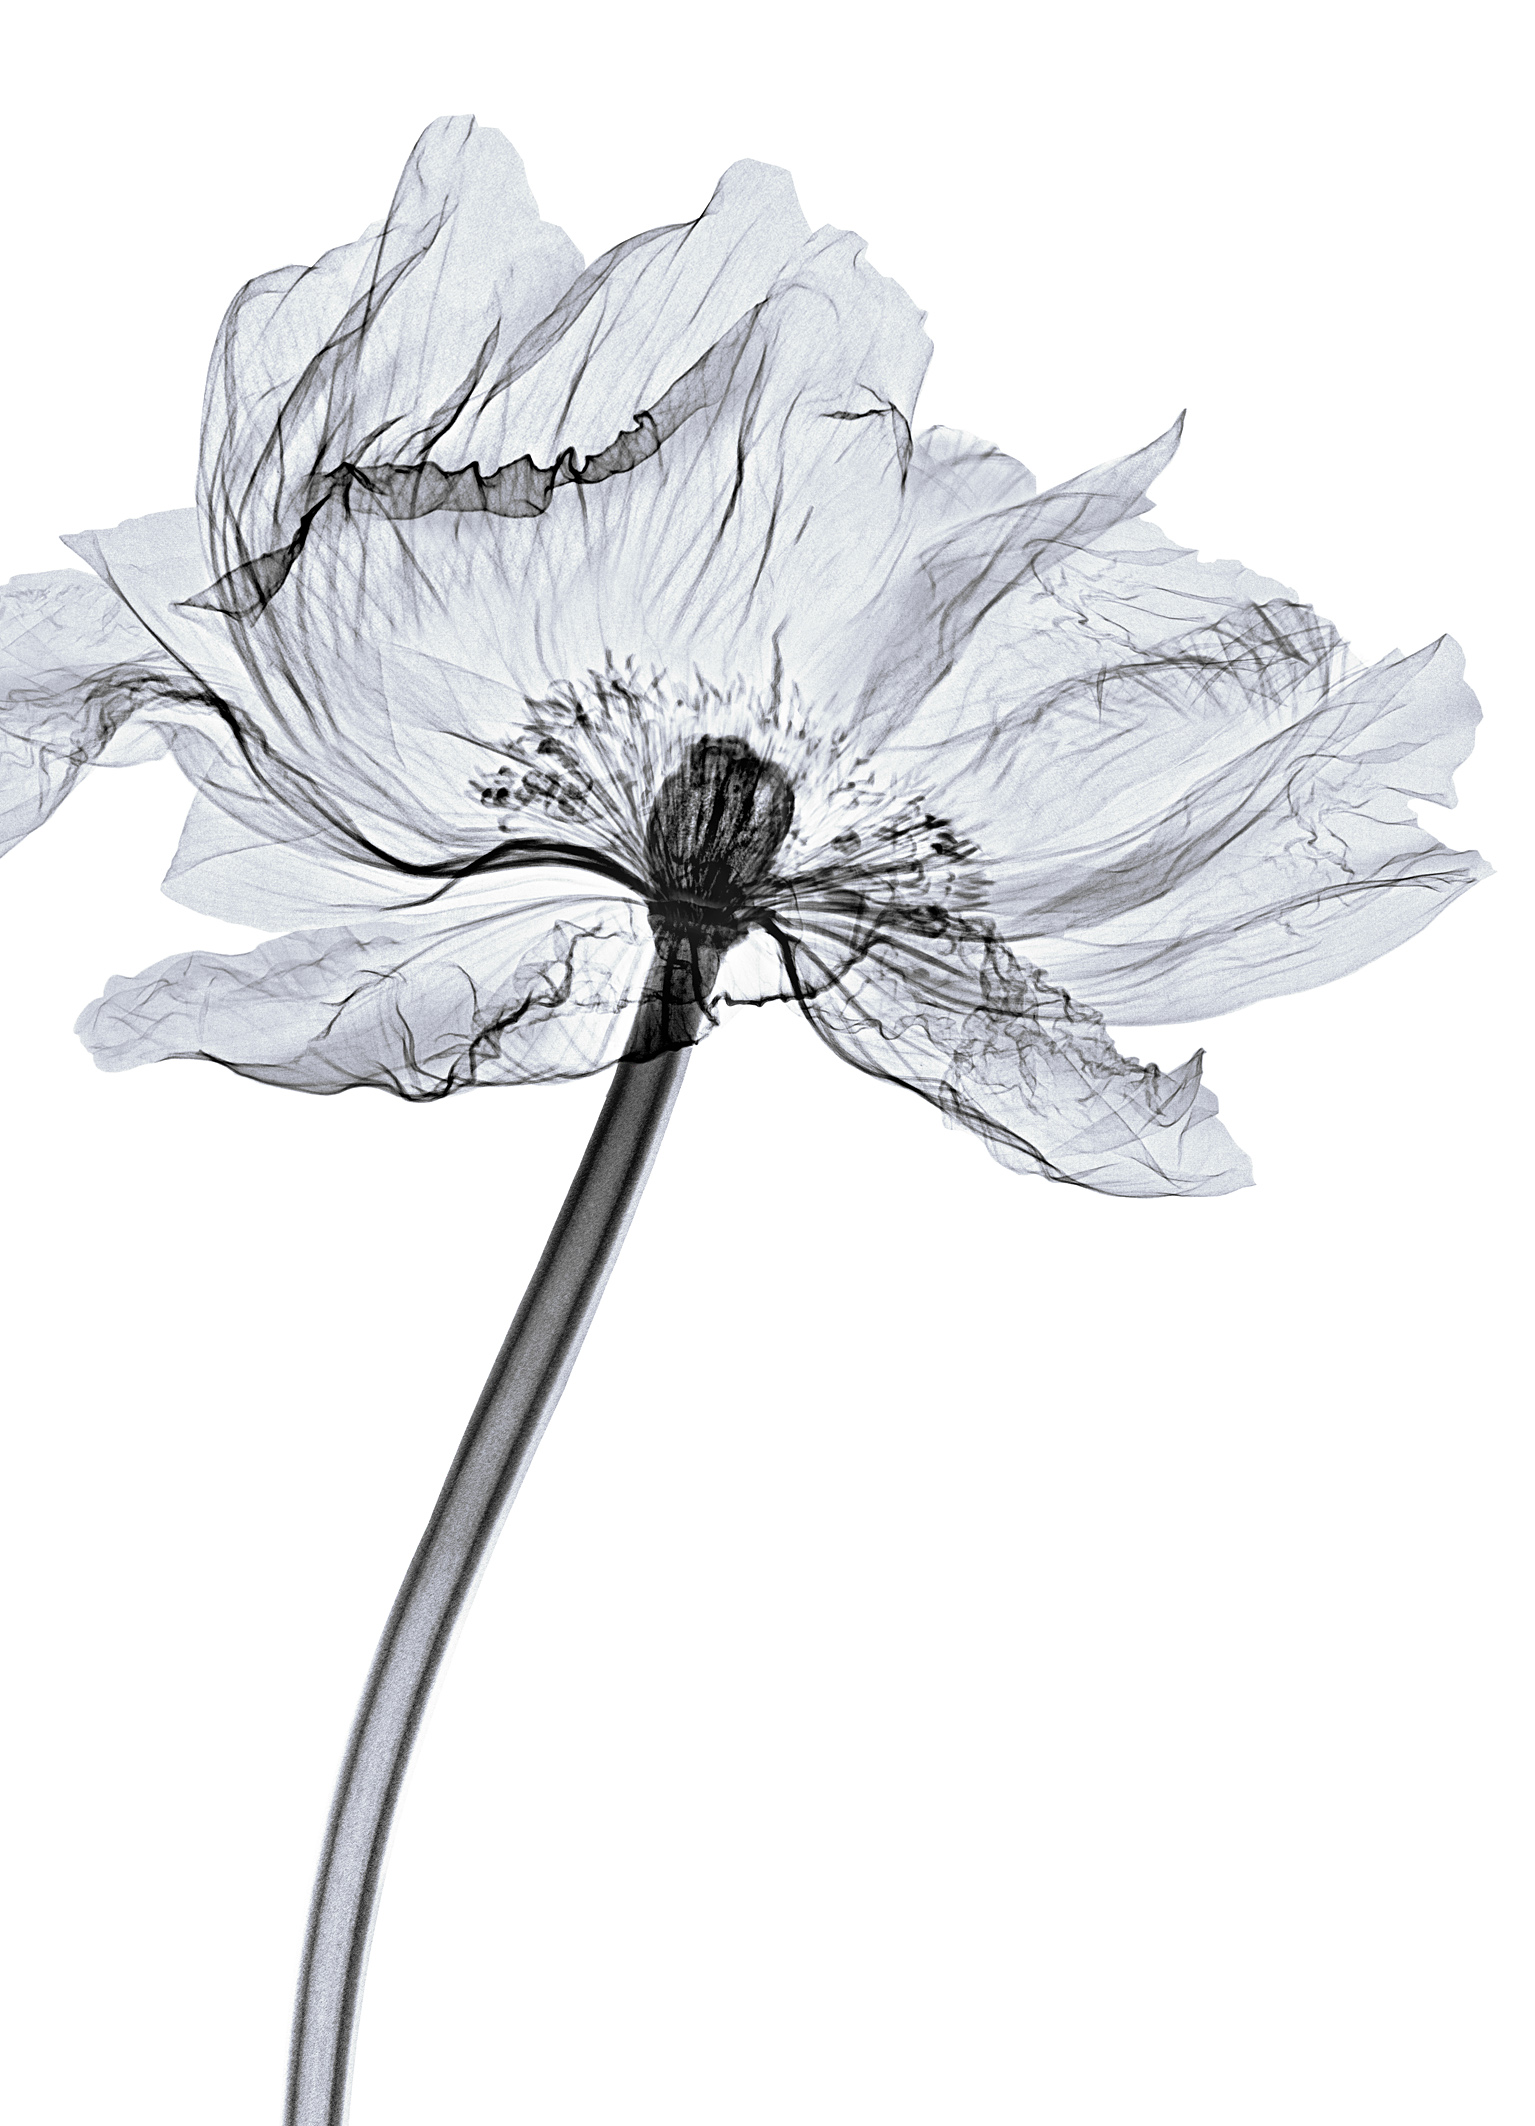 x rayed flower 08